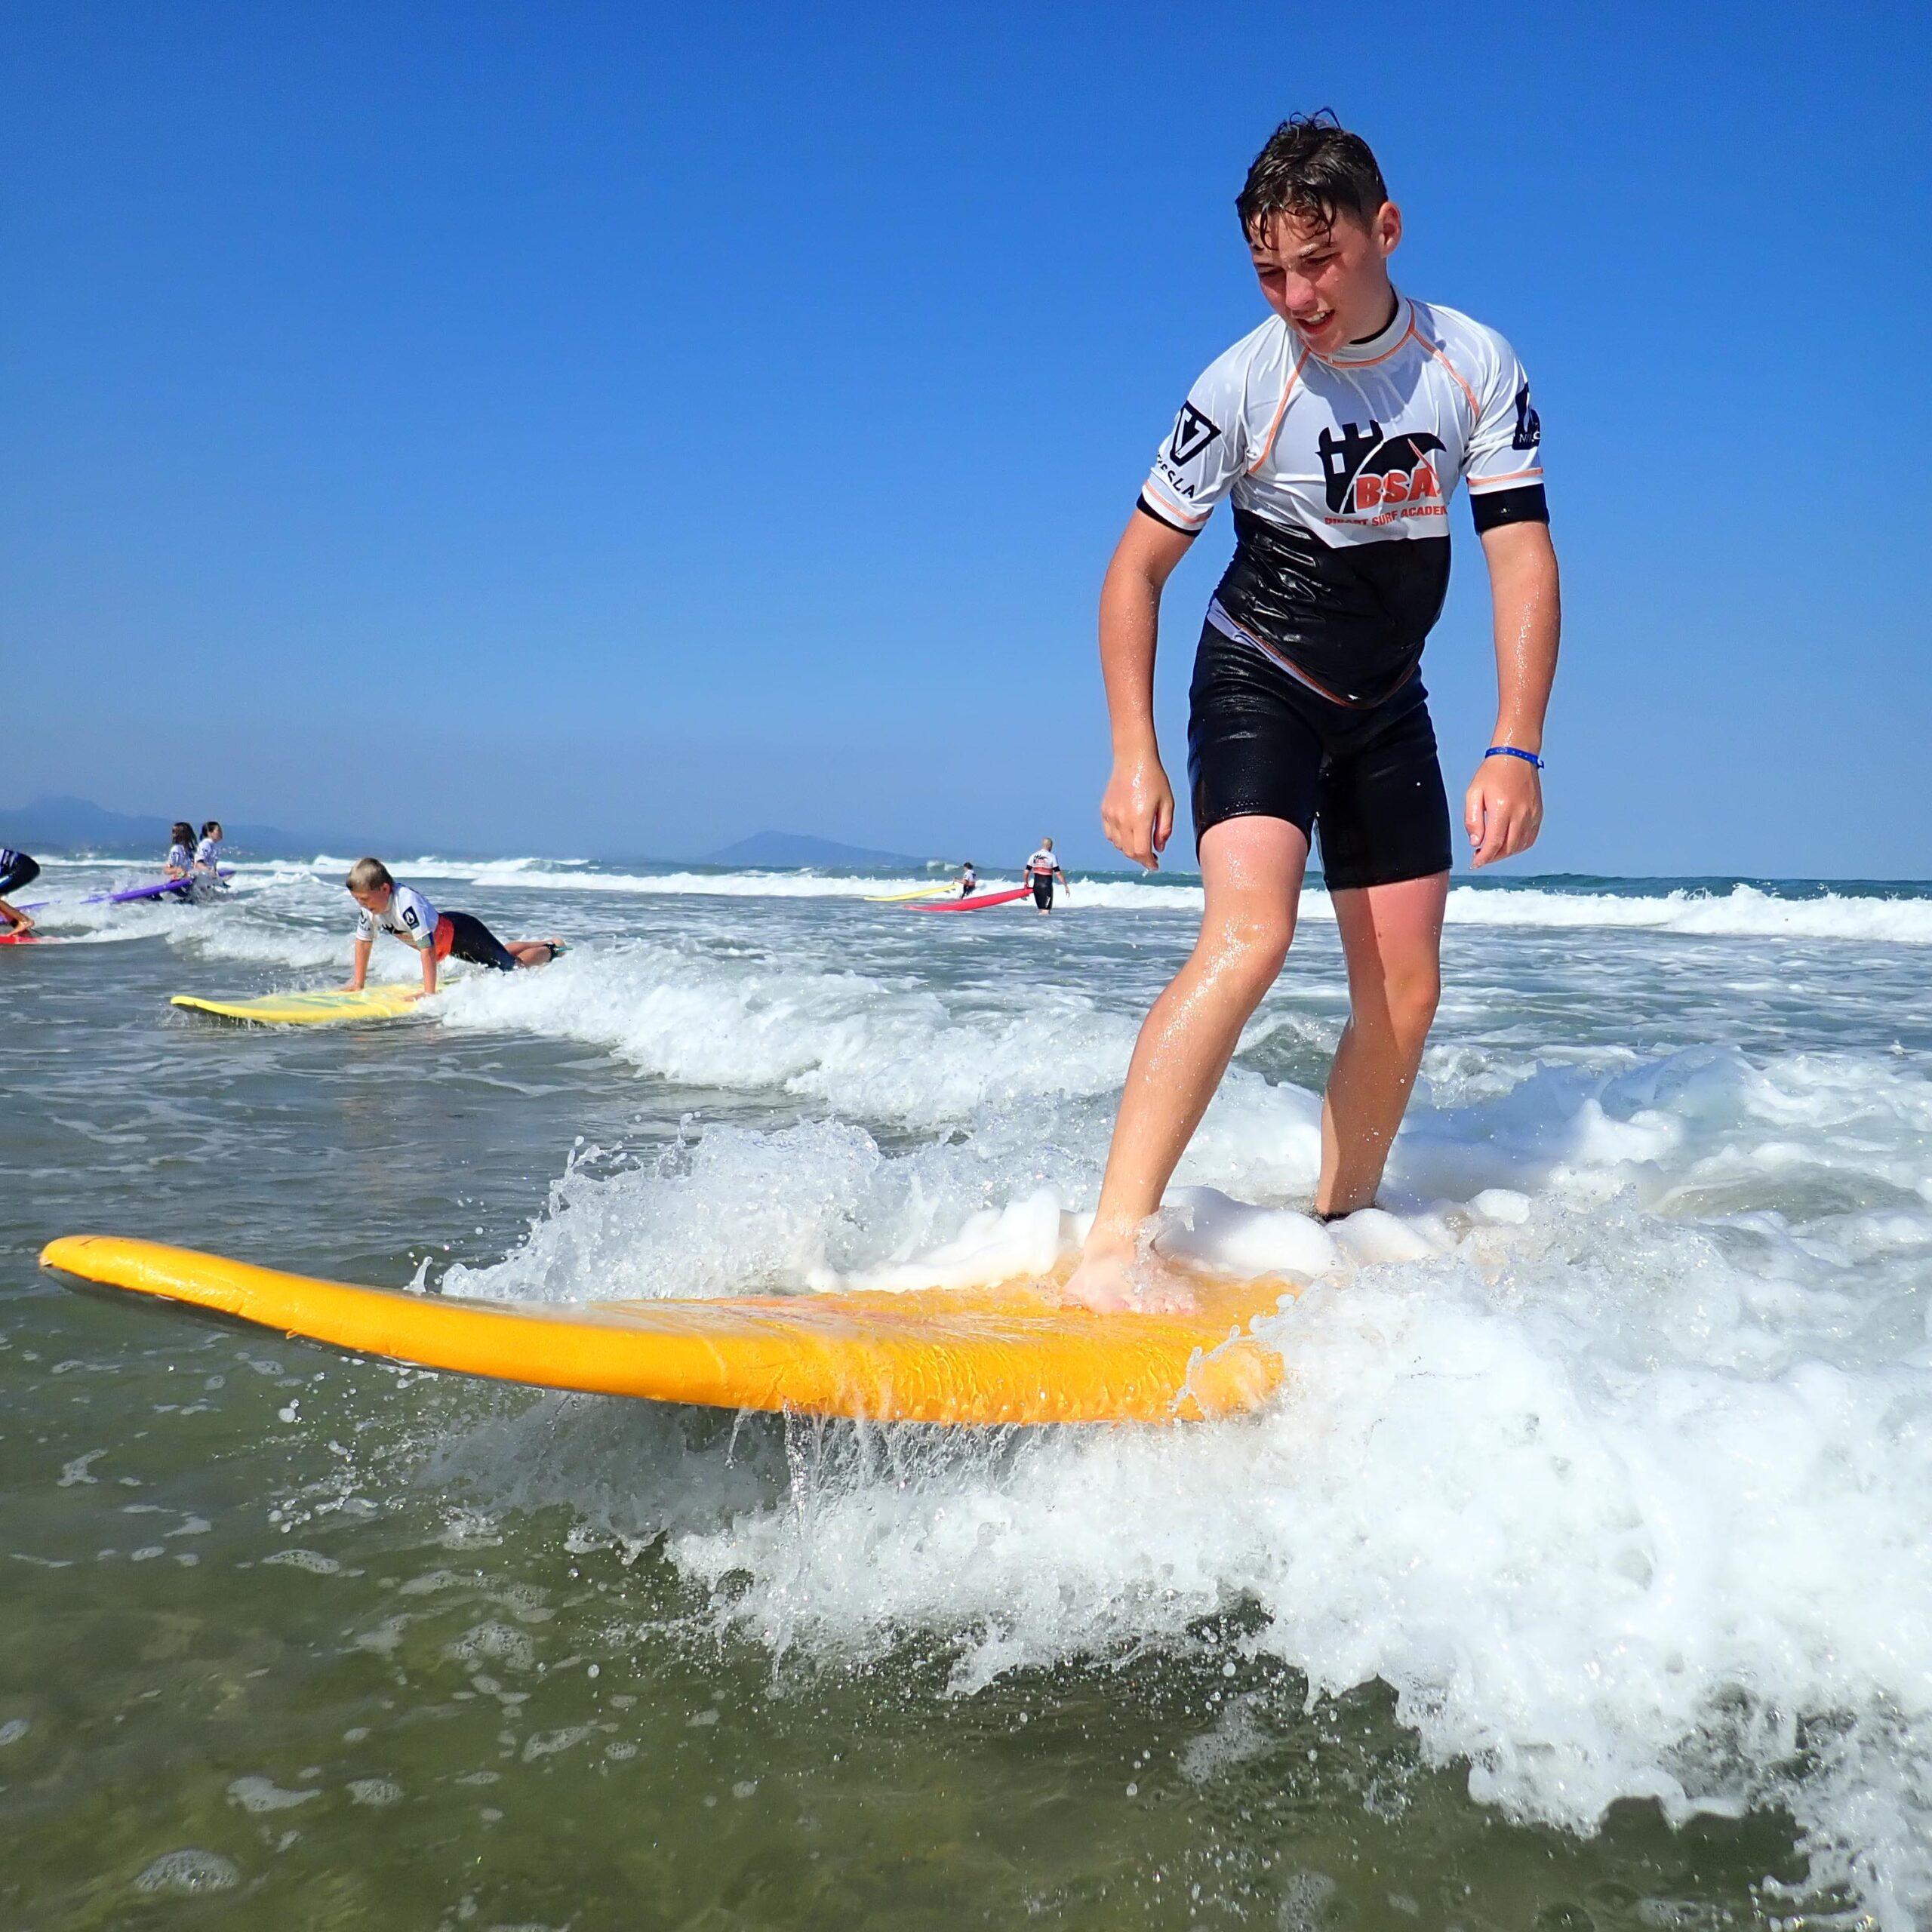 Cours et Stage de Surf Bidart Ilbarritz